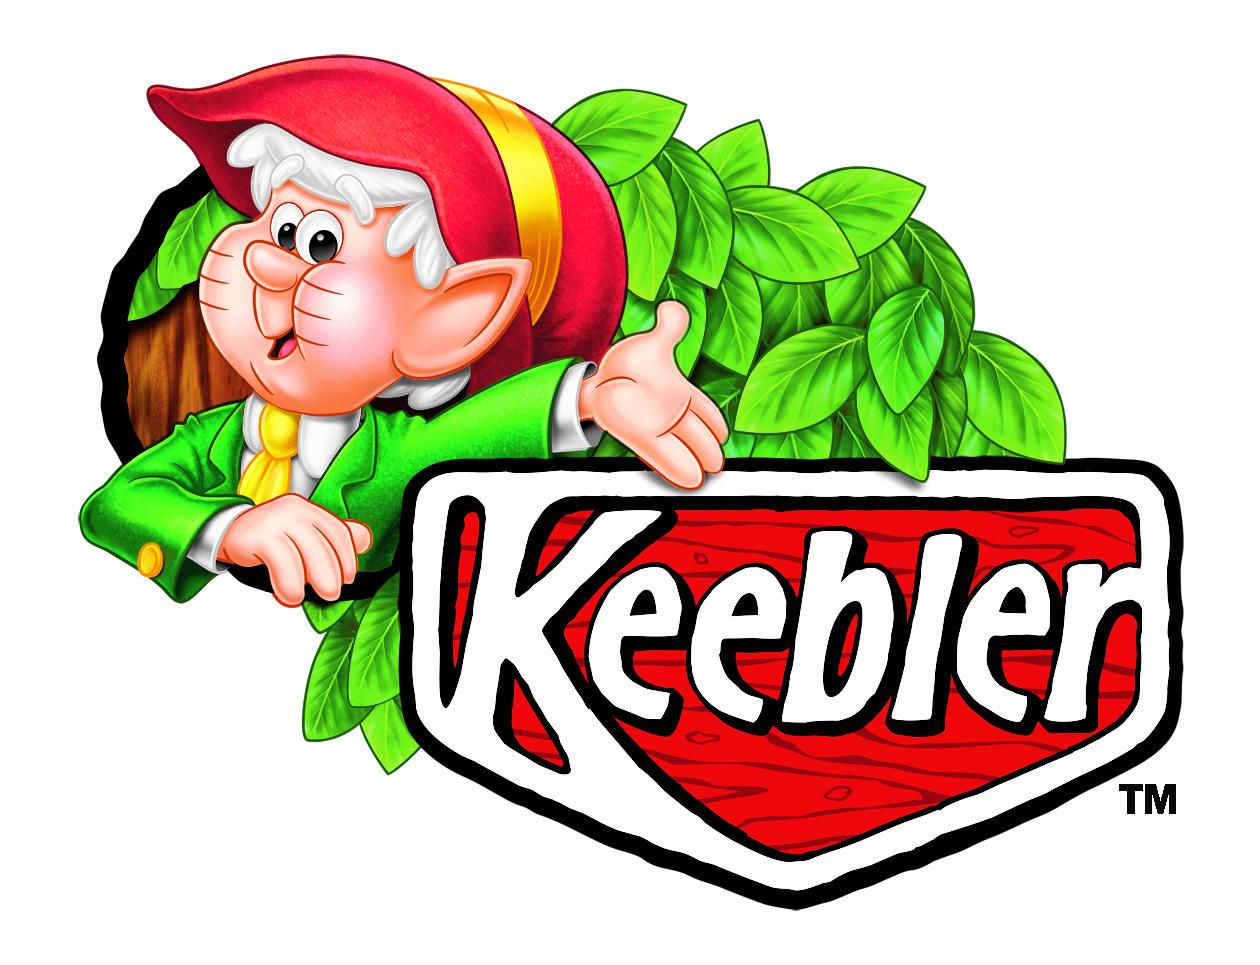 Keebler elves fucking girl porn videos